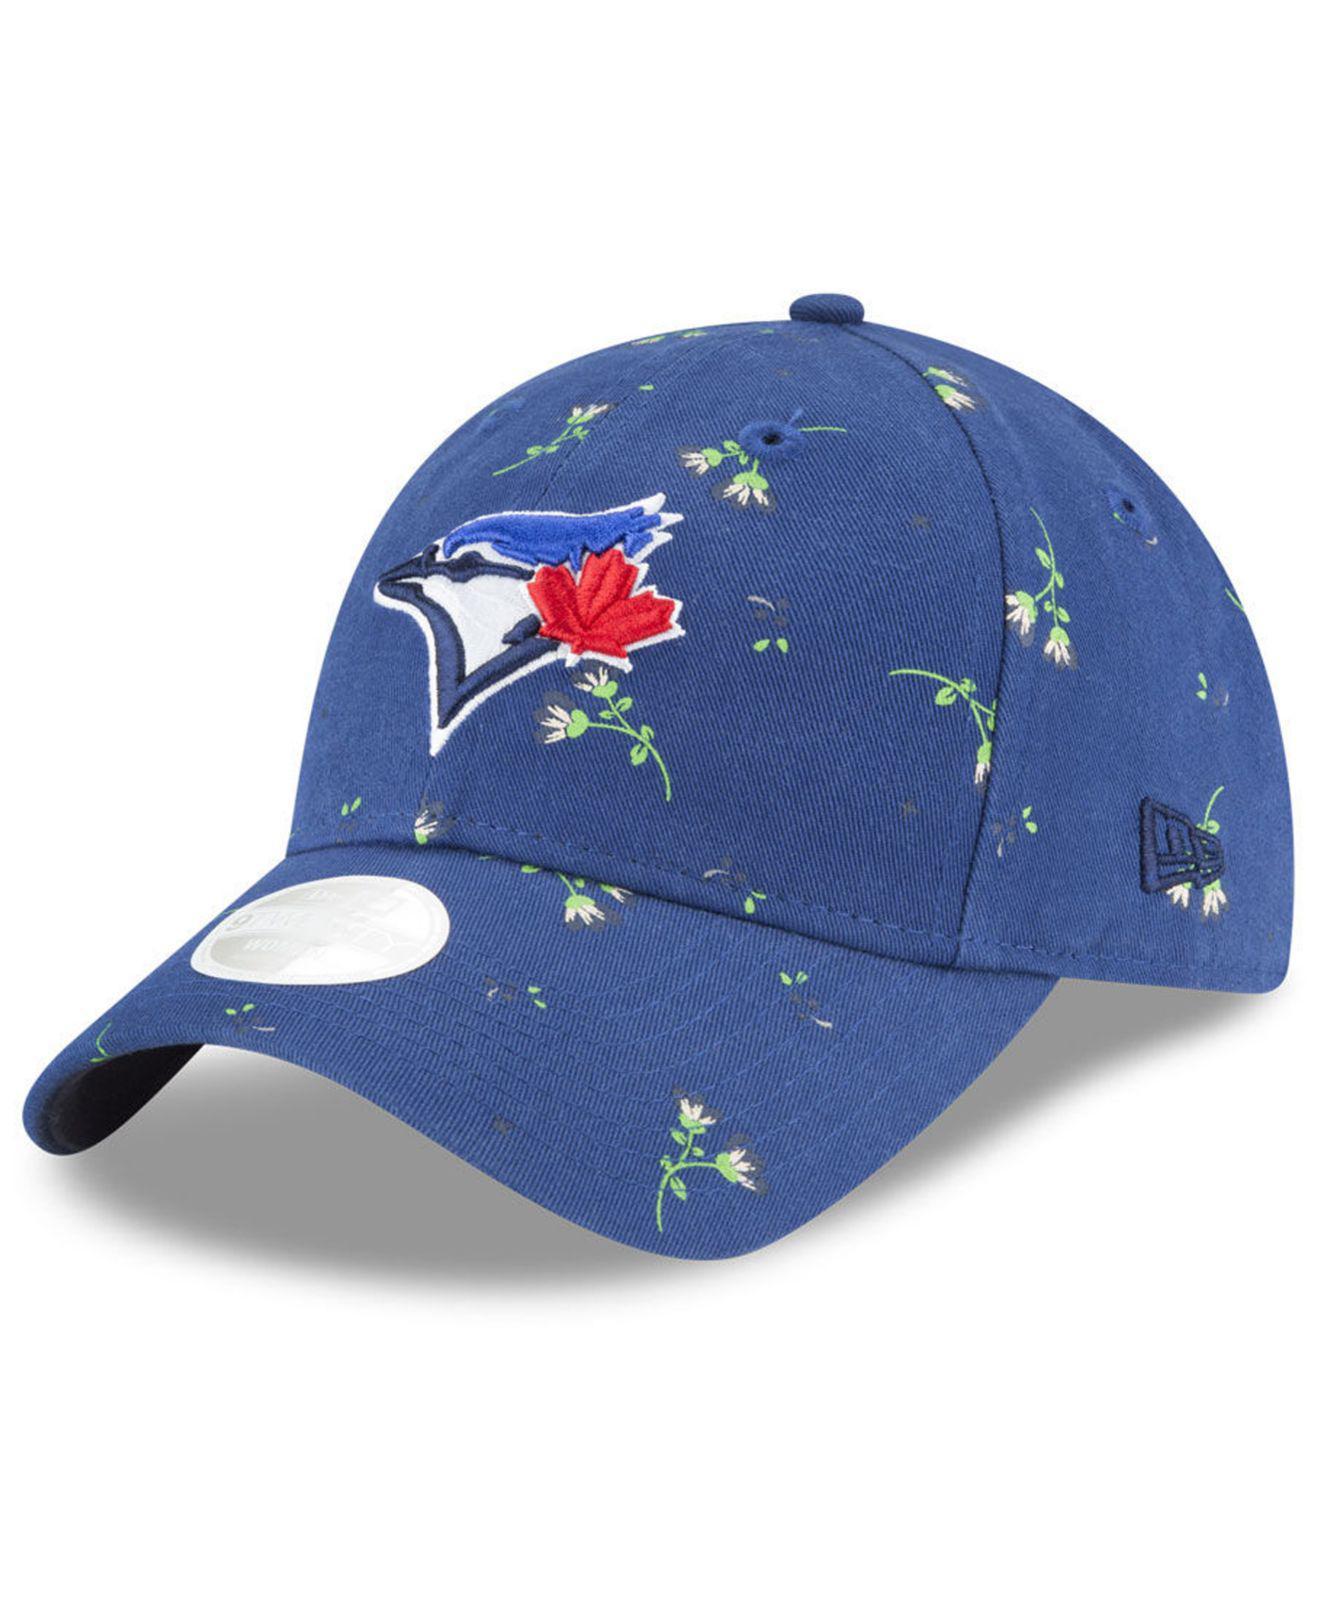 3a36ac56ce2 Lyst - KTZ Toronto Blue Jays Blossom 9twenty Strapback Cap in Blue ...